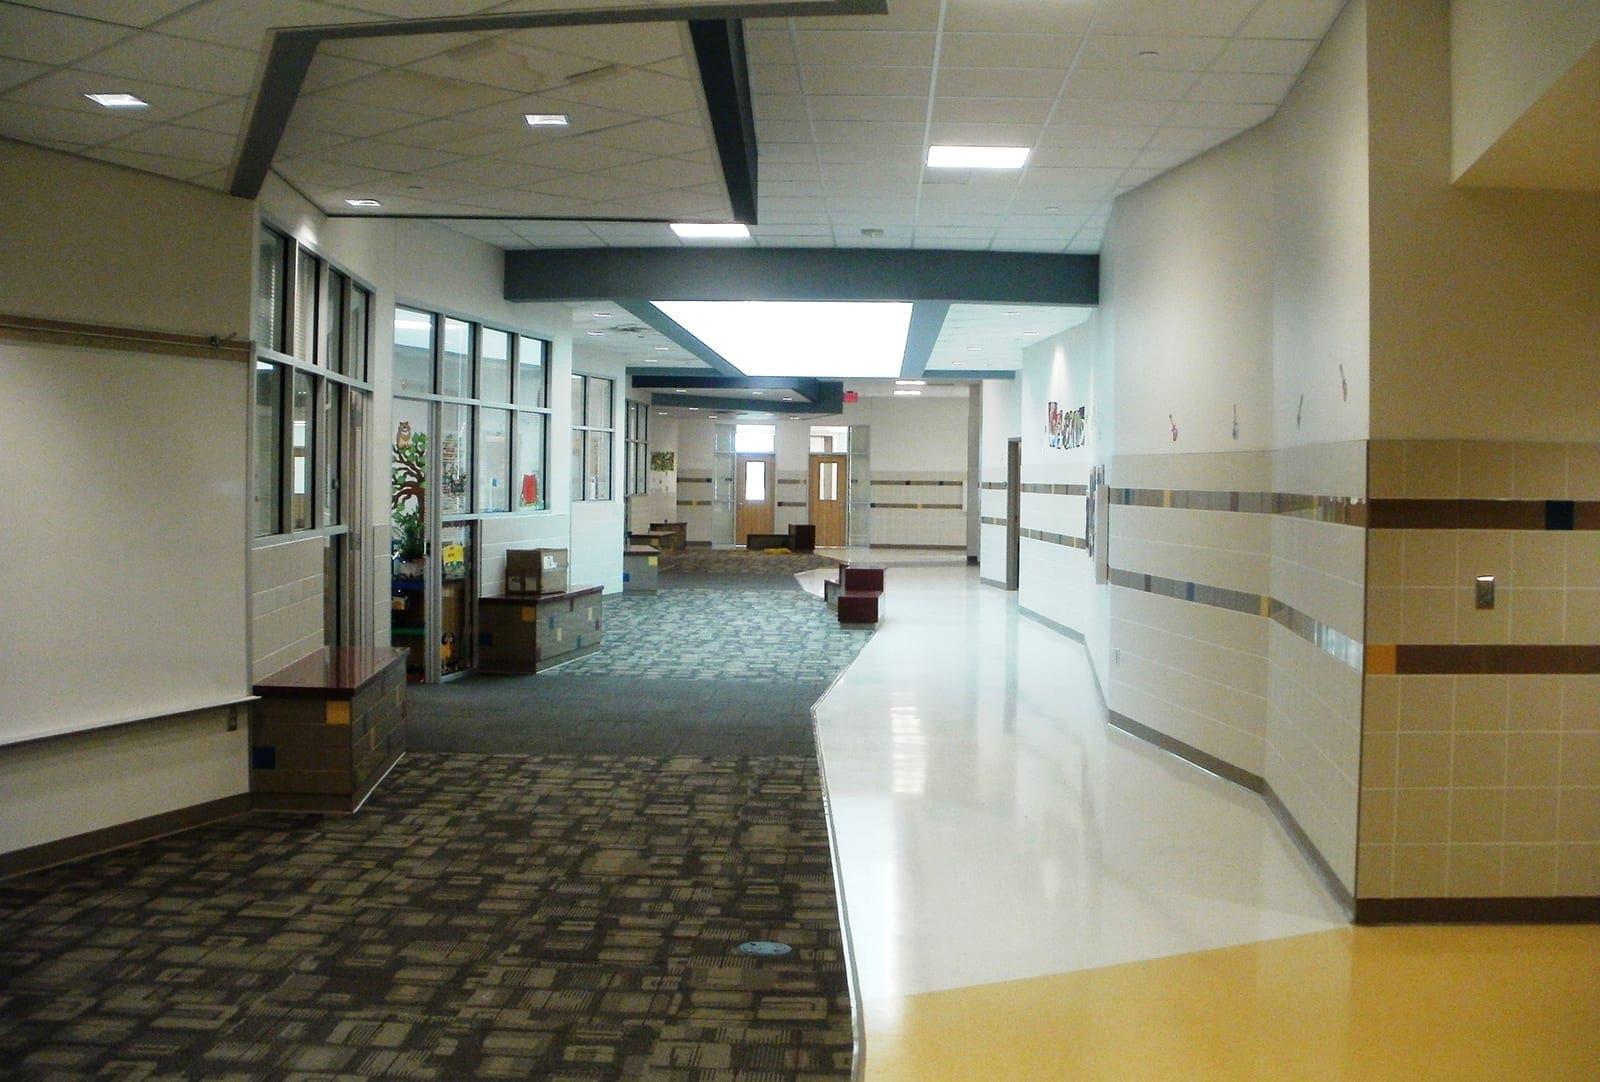 Hallway at Ridgeview ES